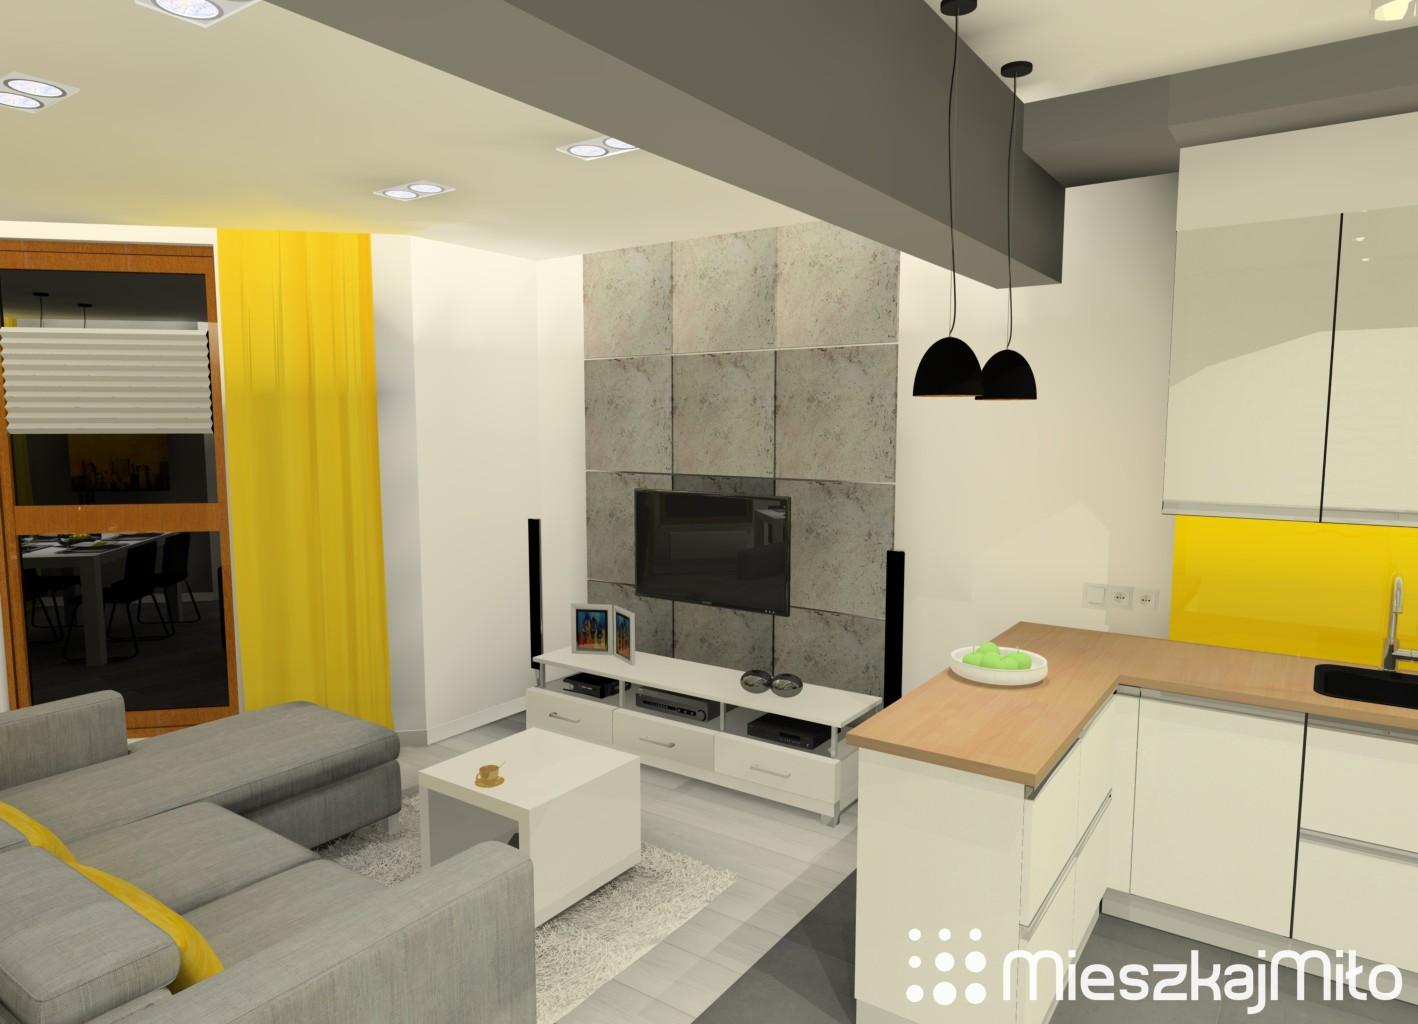 Aran acja salonu z aneksem kuchennym mieszkaj mi o for Beton salon